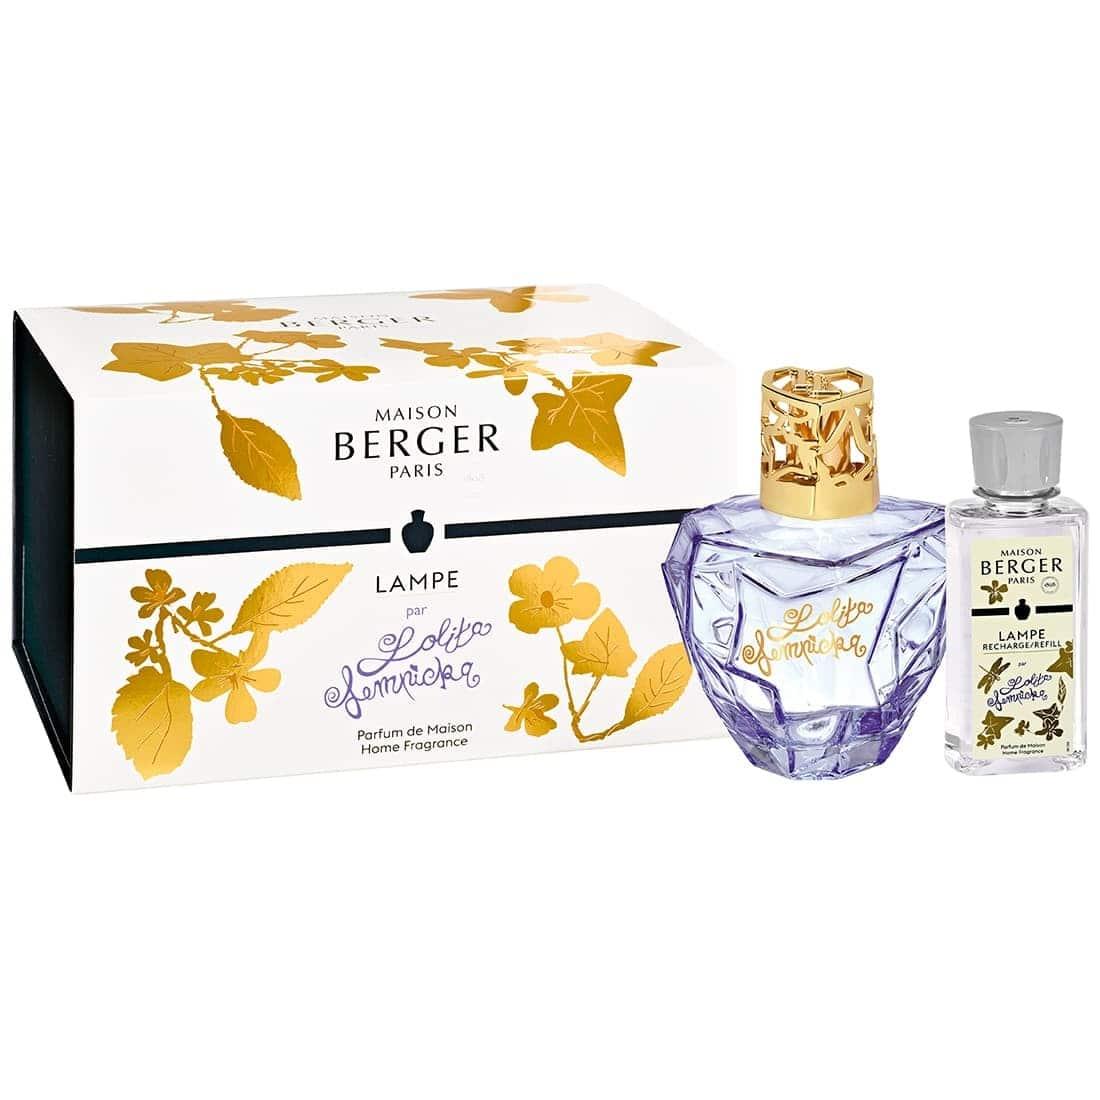 Coffret Premium Lampe Berger Lolita Lempicka Parme 65 00